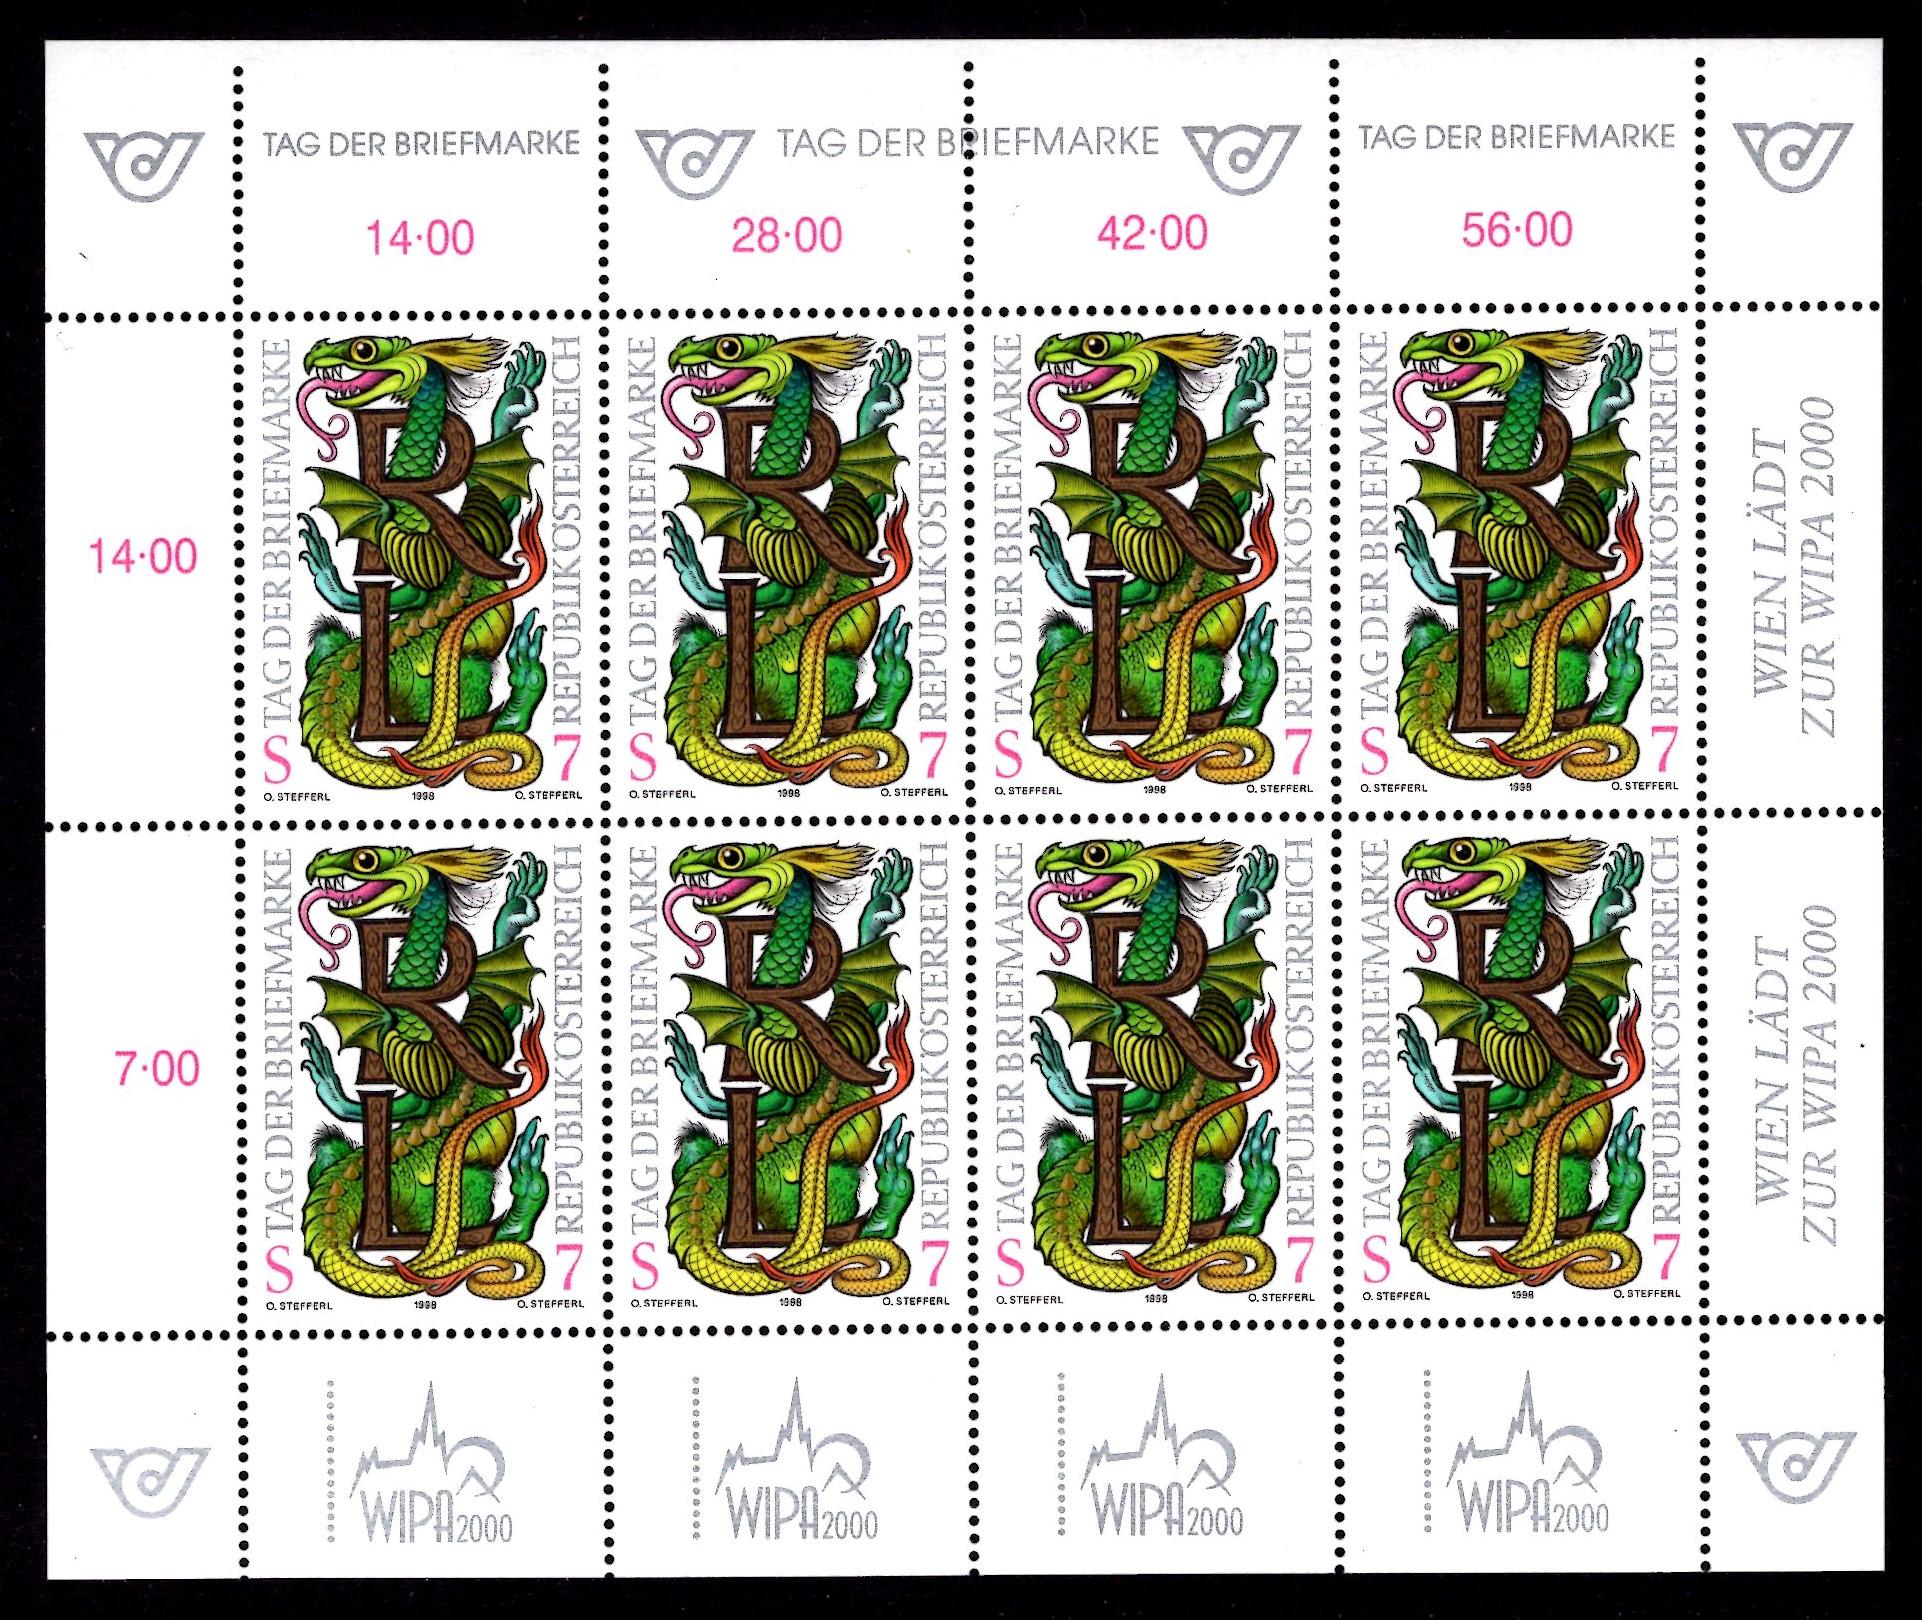 Österr KLBG Tag der Briefmarke 1998 Michel-Nr 2260